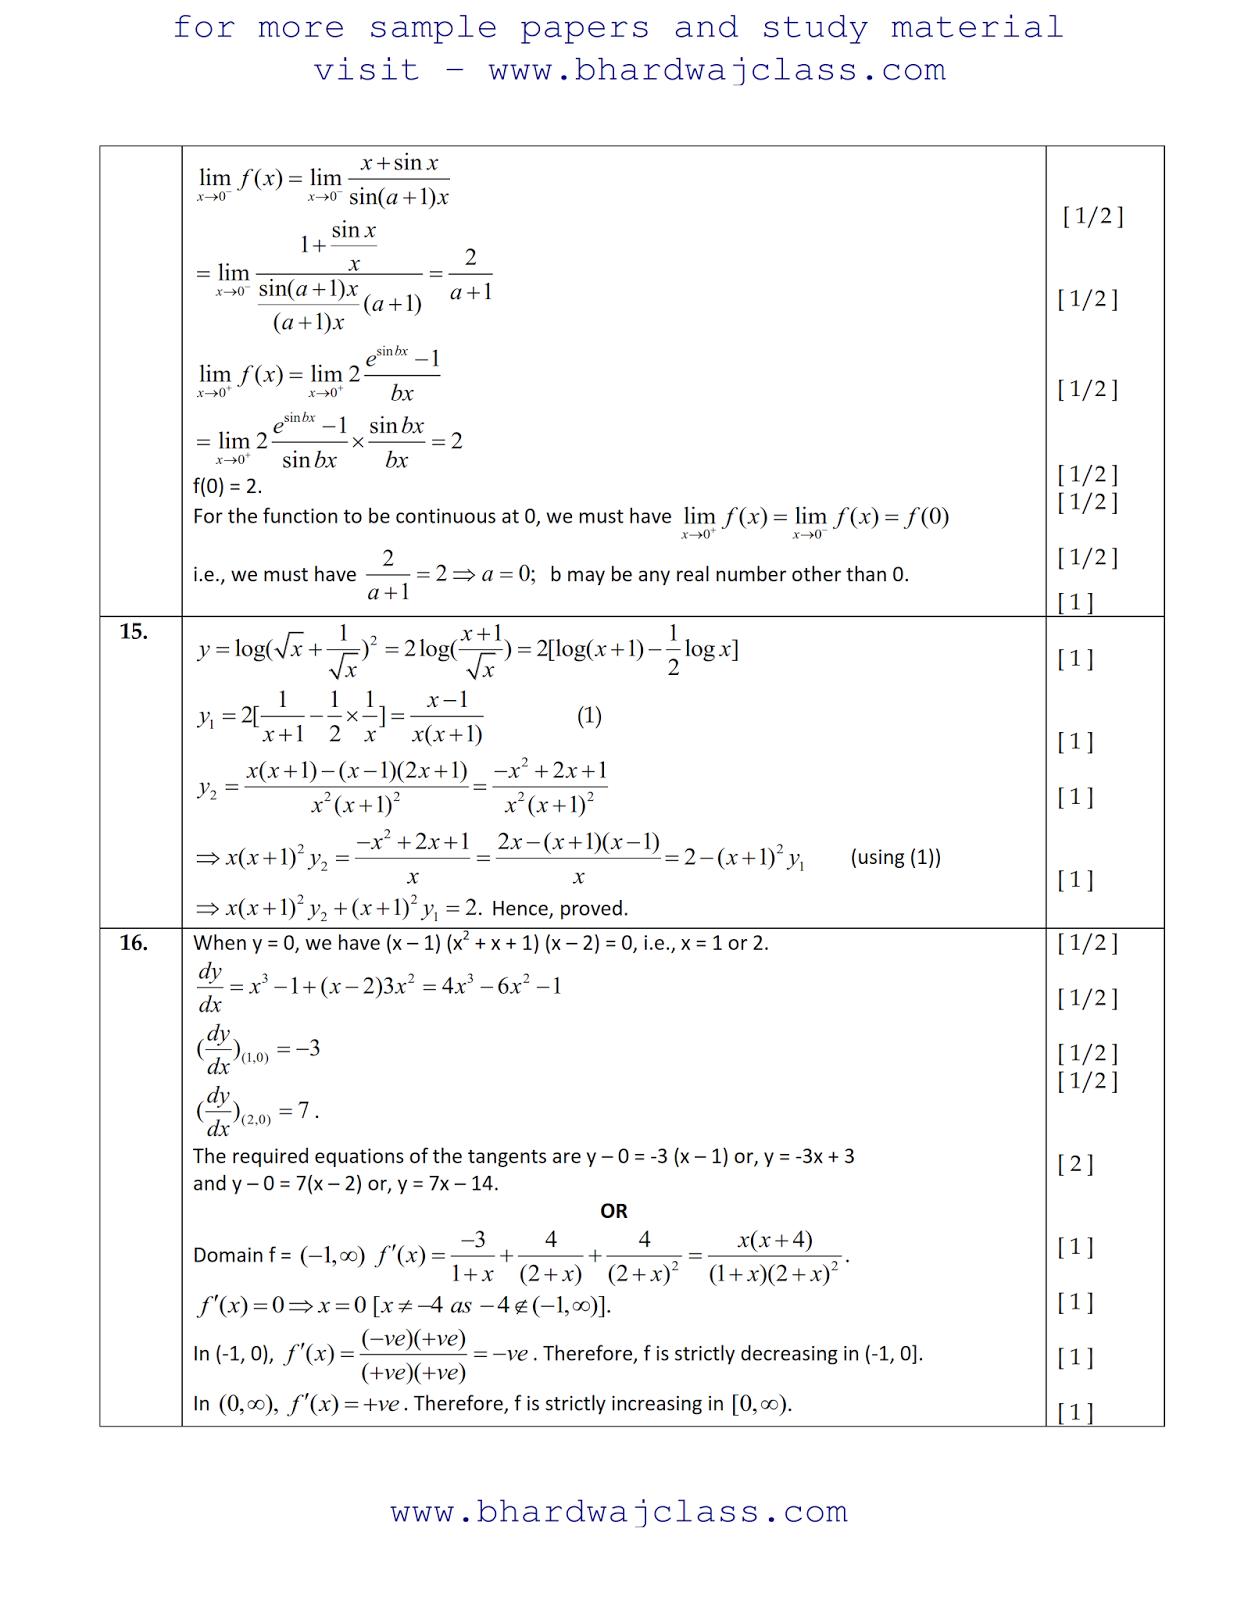 MATHS SAMPLE PAPER SOLUTION 2017-18